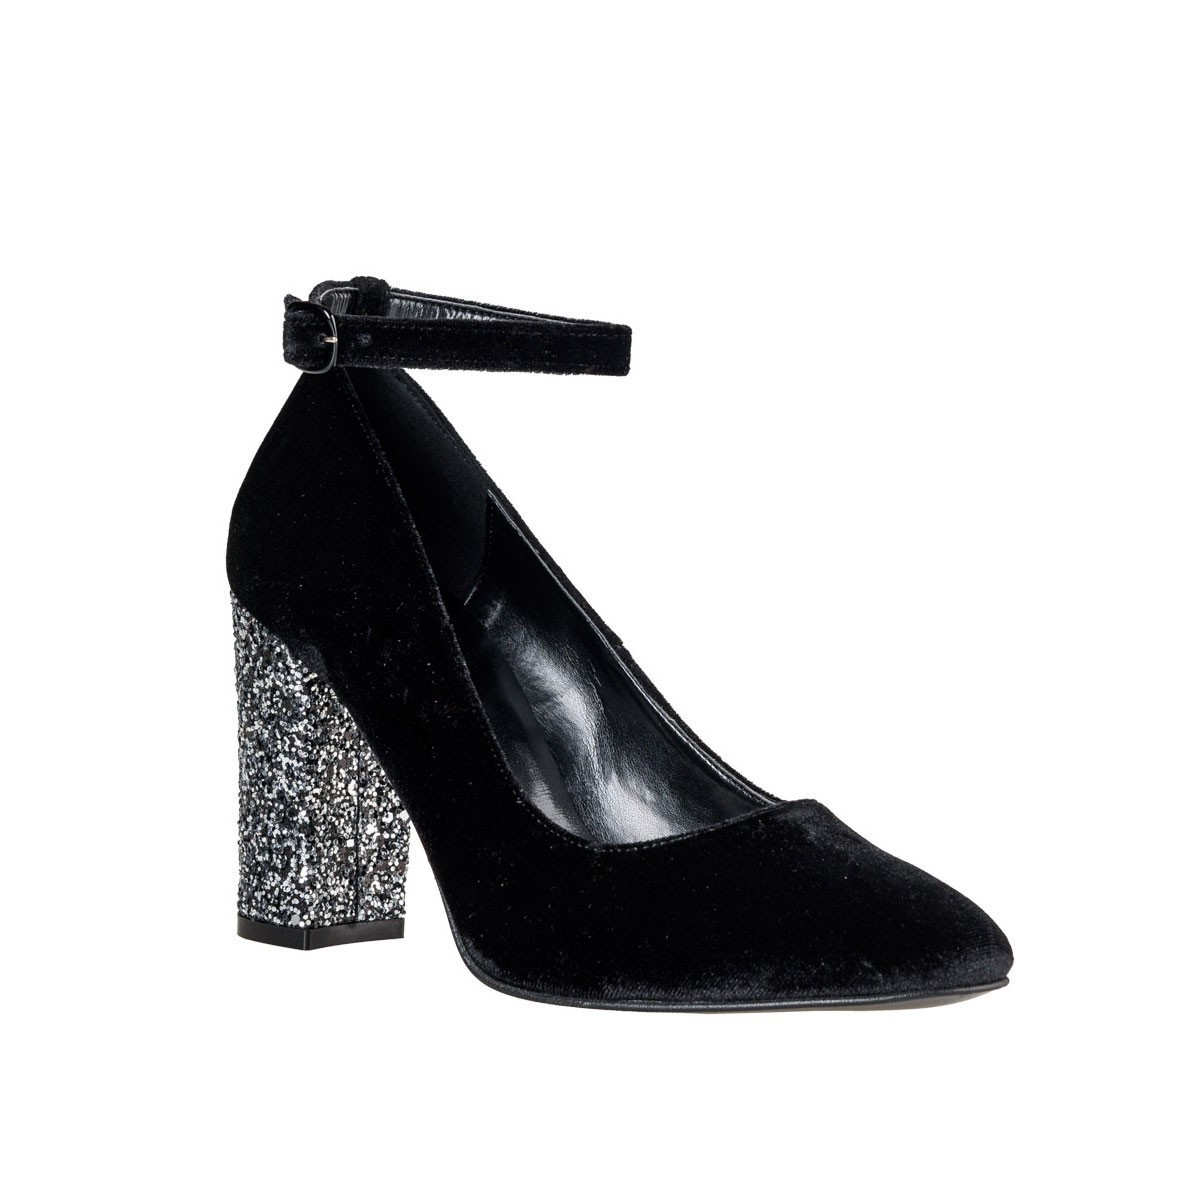 Mairiboo by Envie Shoes Γυναικεία Παπούτσια Γόβες M03-06810-23 Μαύρο/DOROTHY